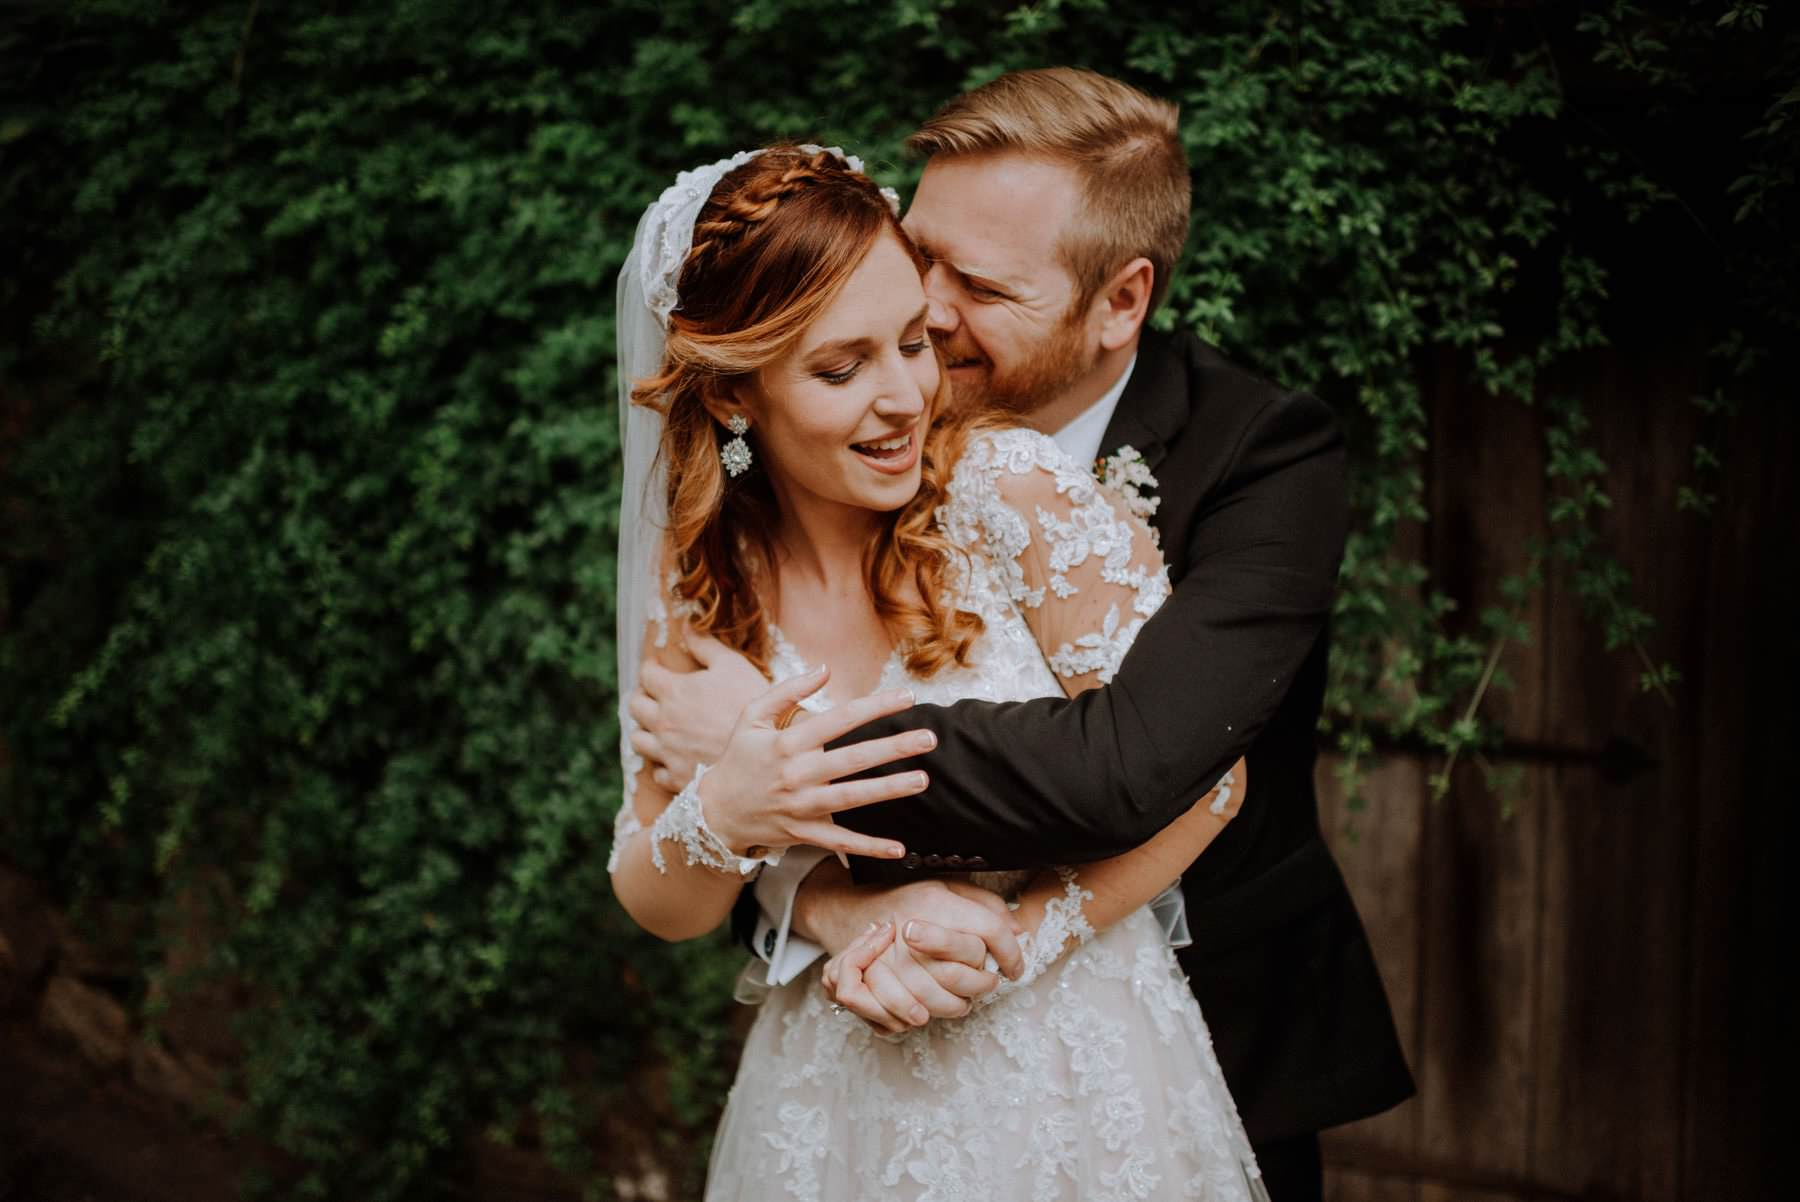 welkinweir-wedding-photography-22.jpg